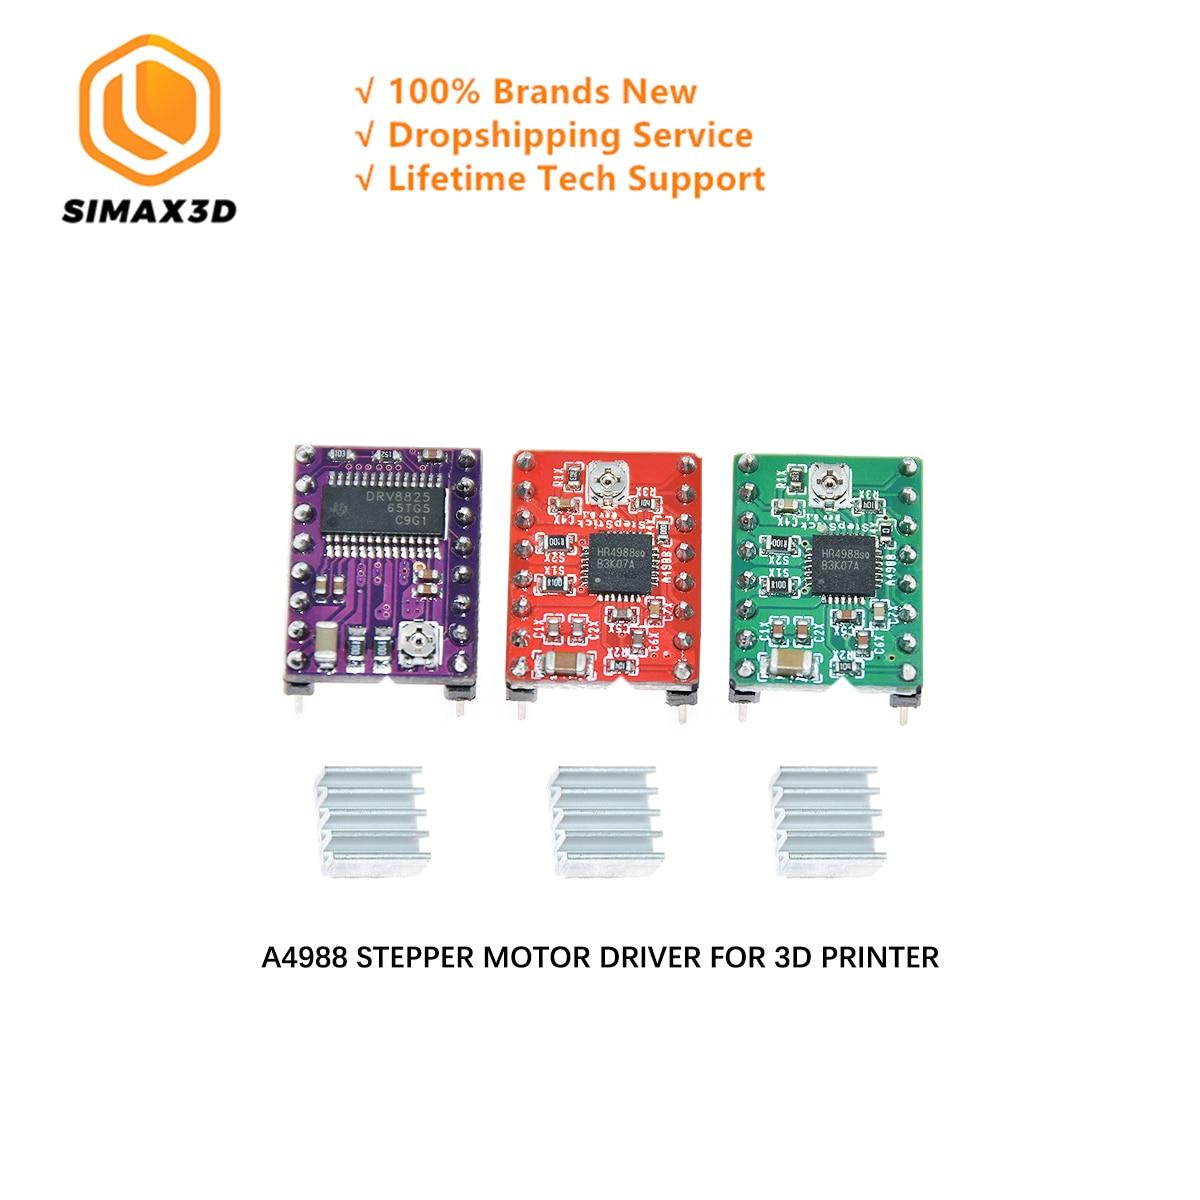 SIMAX3D Stepper Motor Driver A4988 DRV8825 Reprap Stepper Driver Module+ Heat Sink With Sticker For DIY 3D Printer Accessories